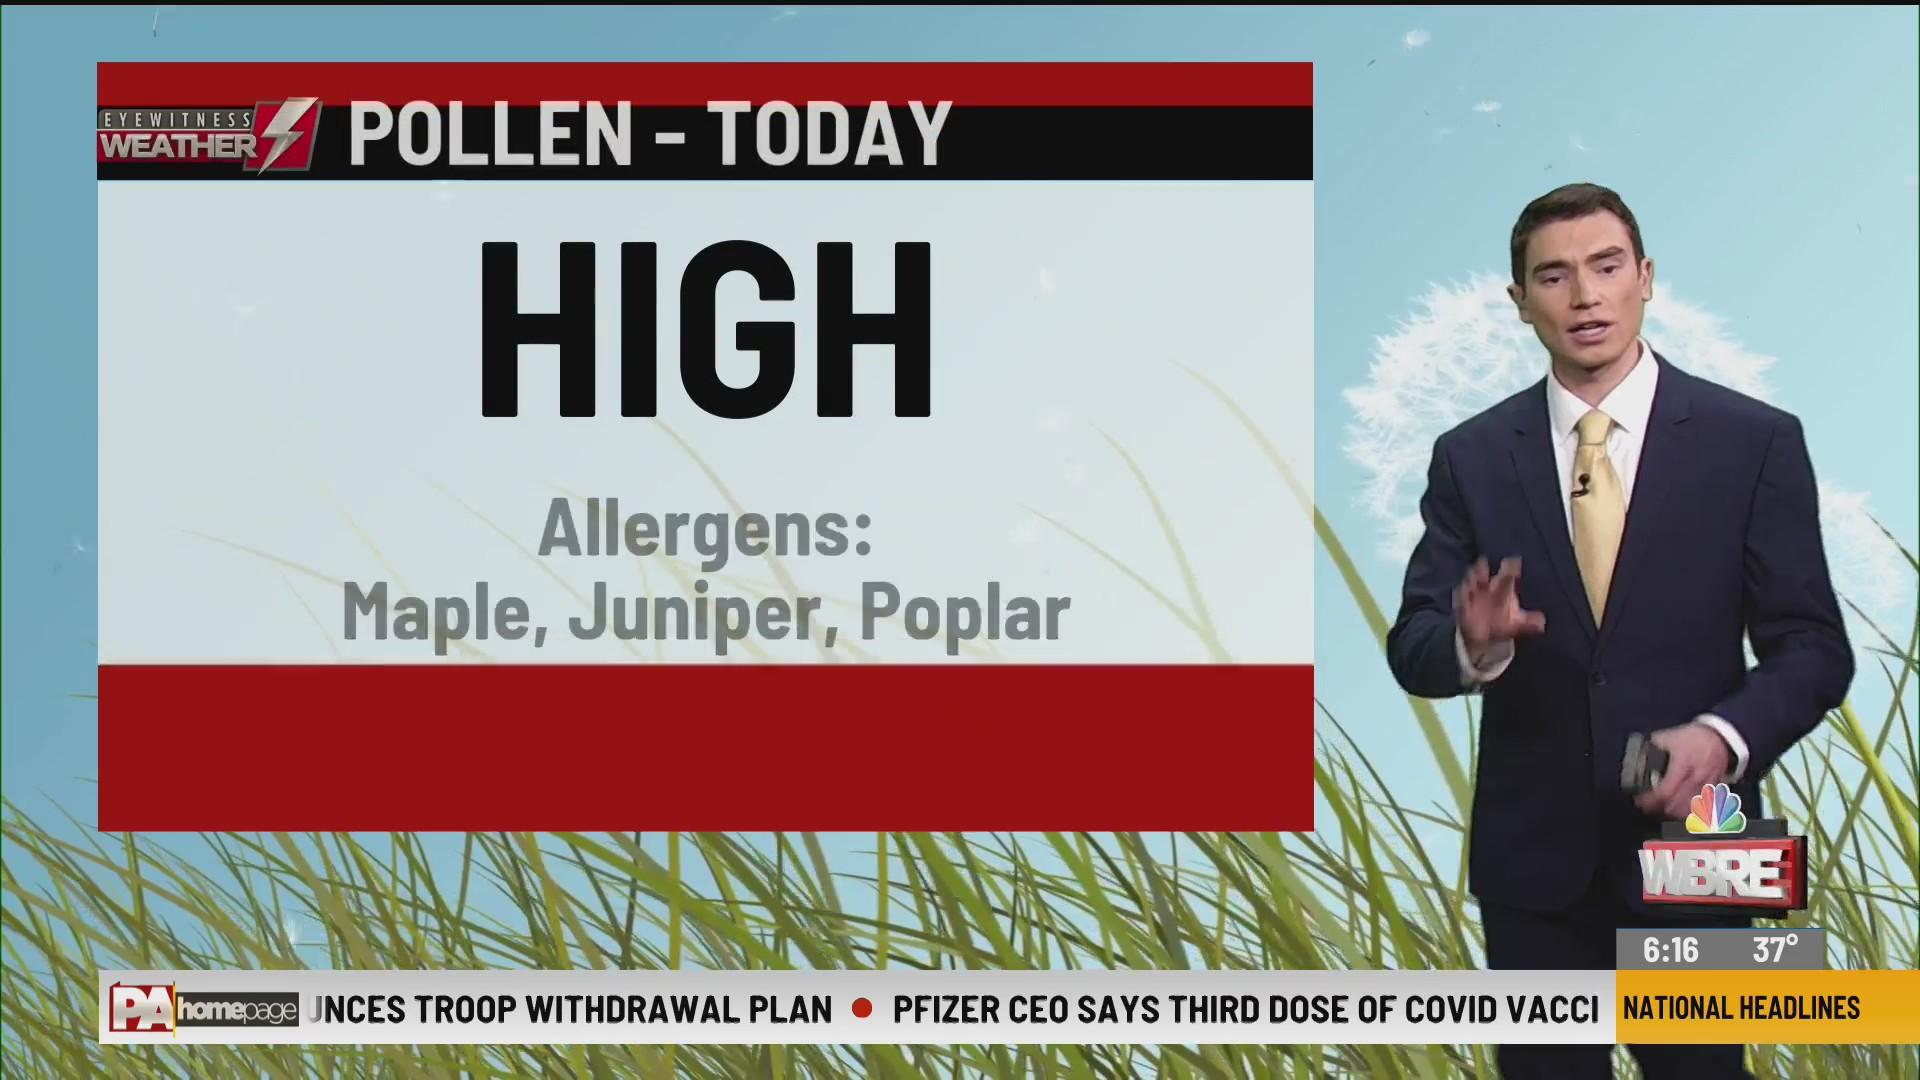 Allergy Alert April 16, 2020